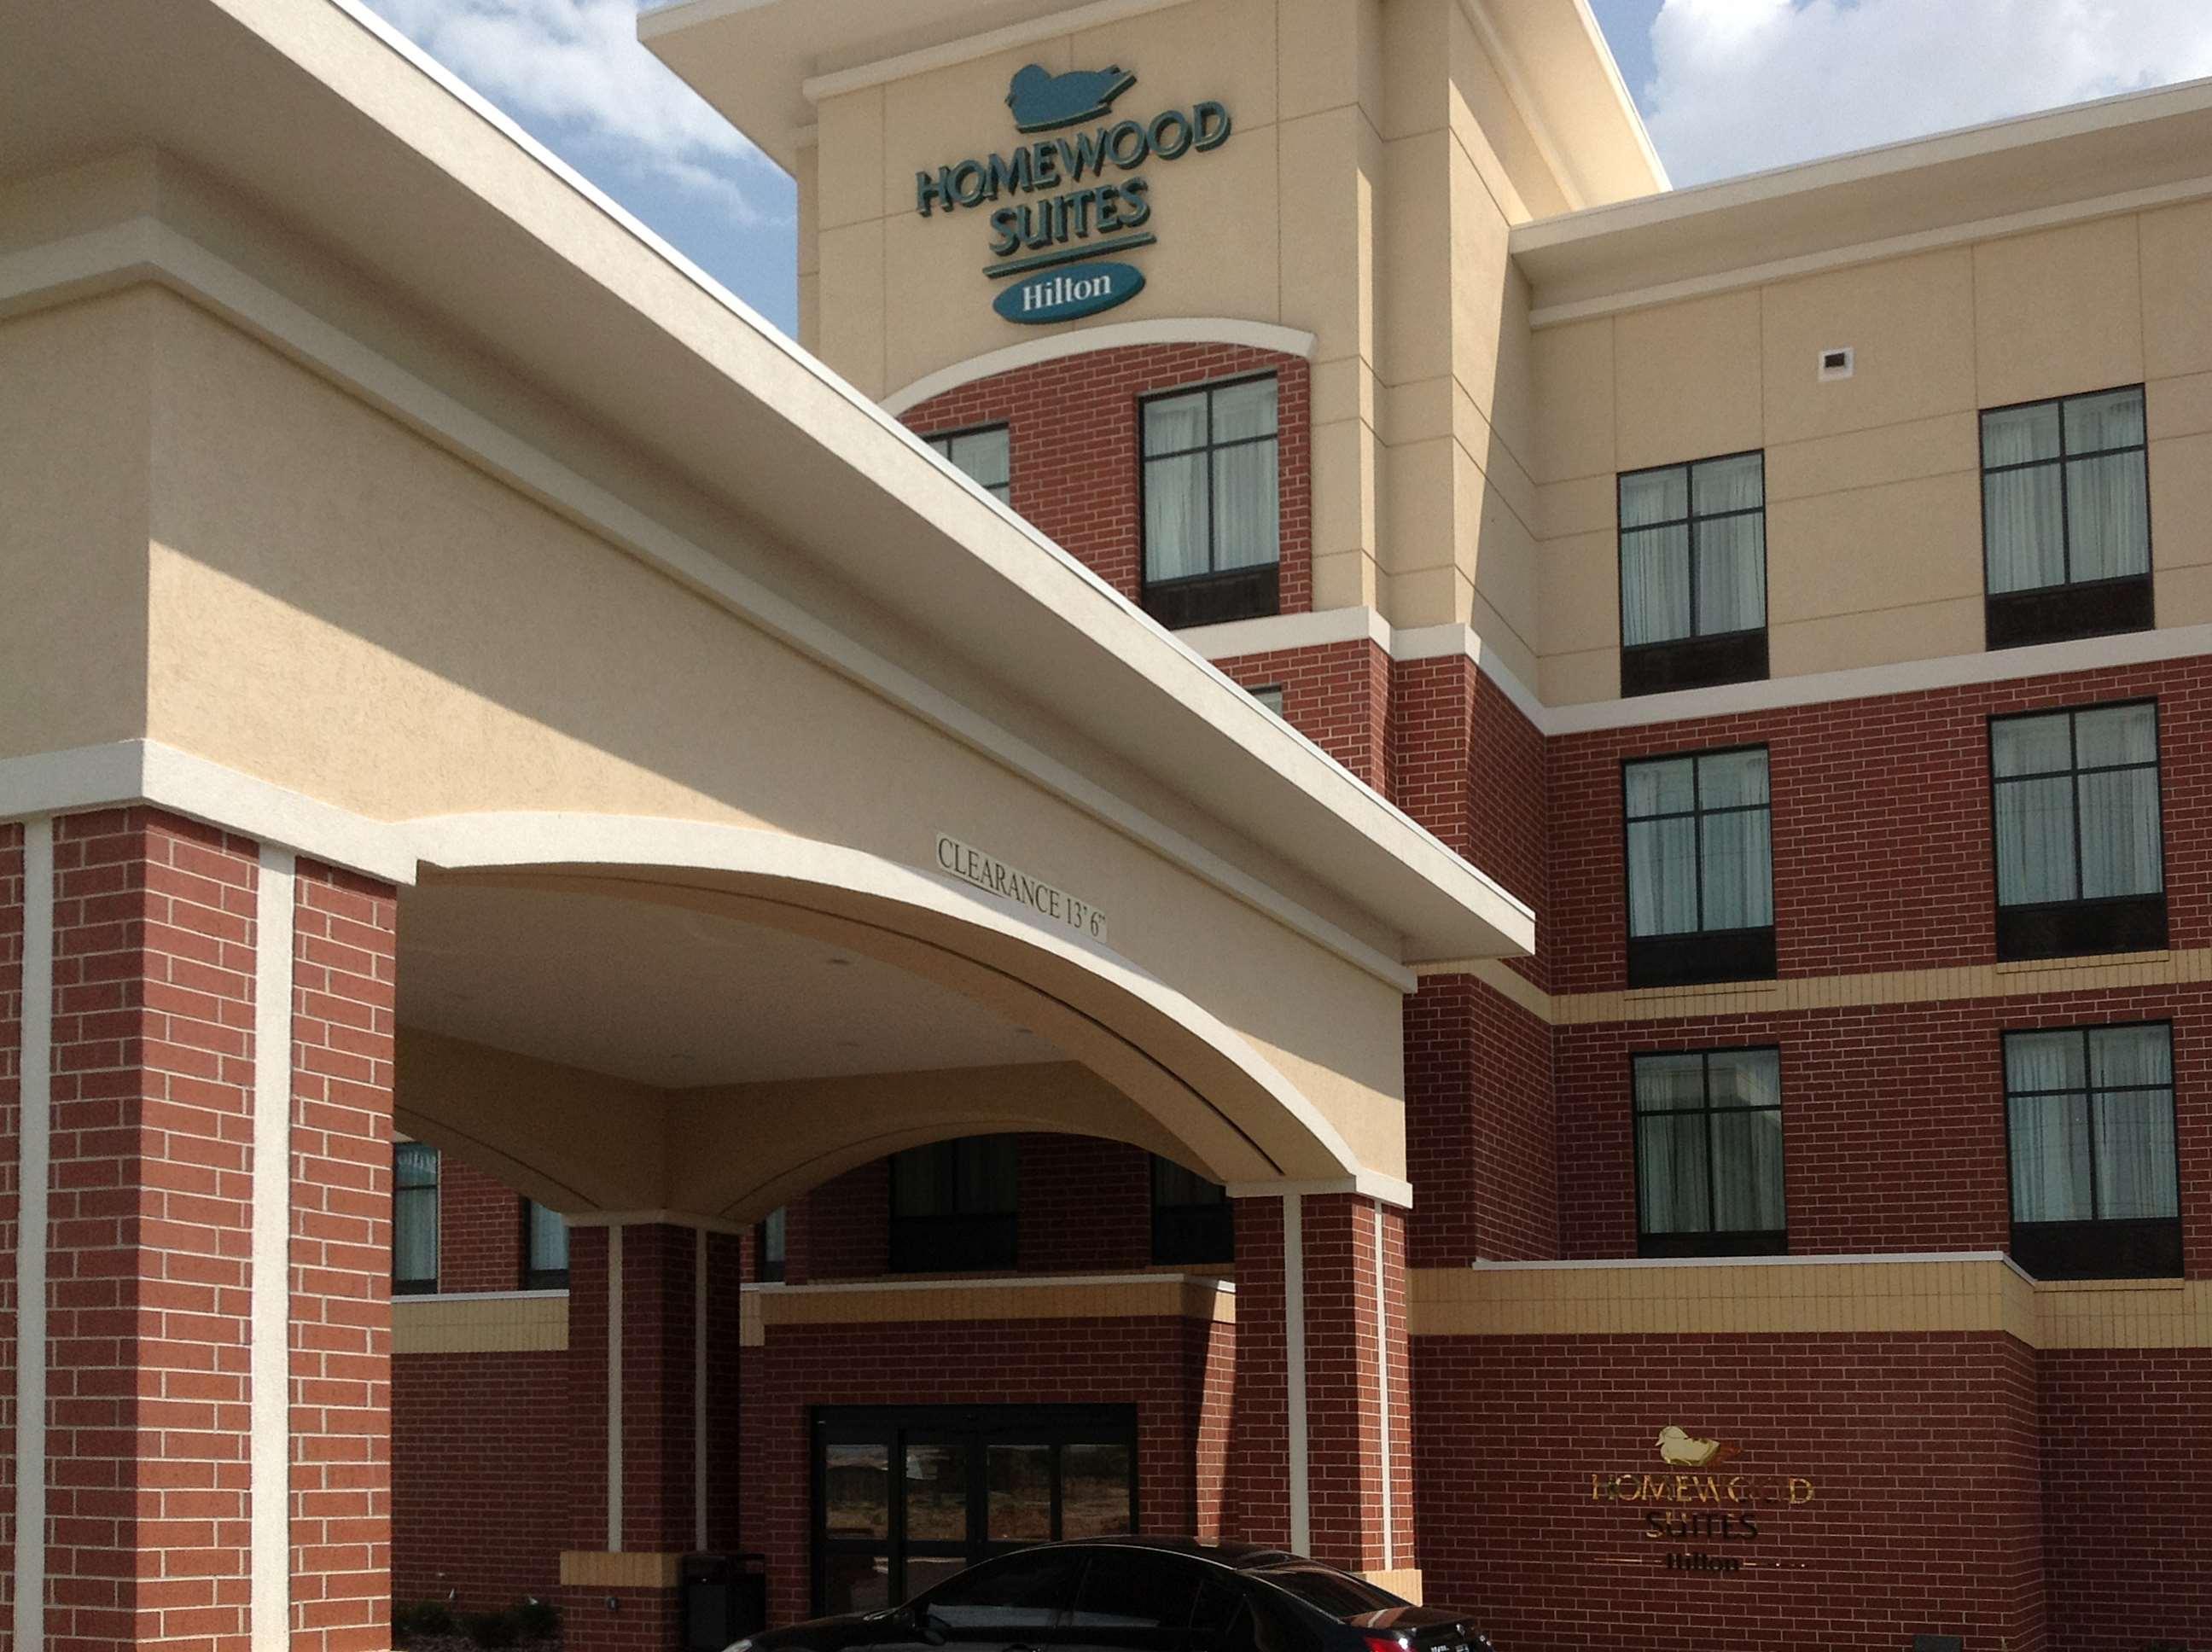 Homewood Suites by Hilton Joplin, MO image 0